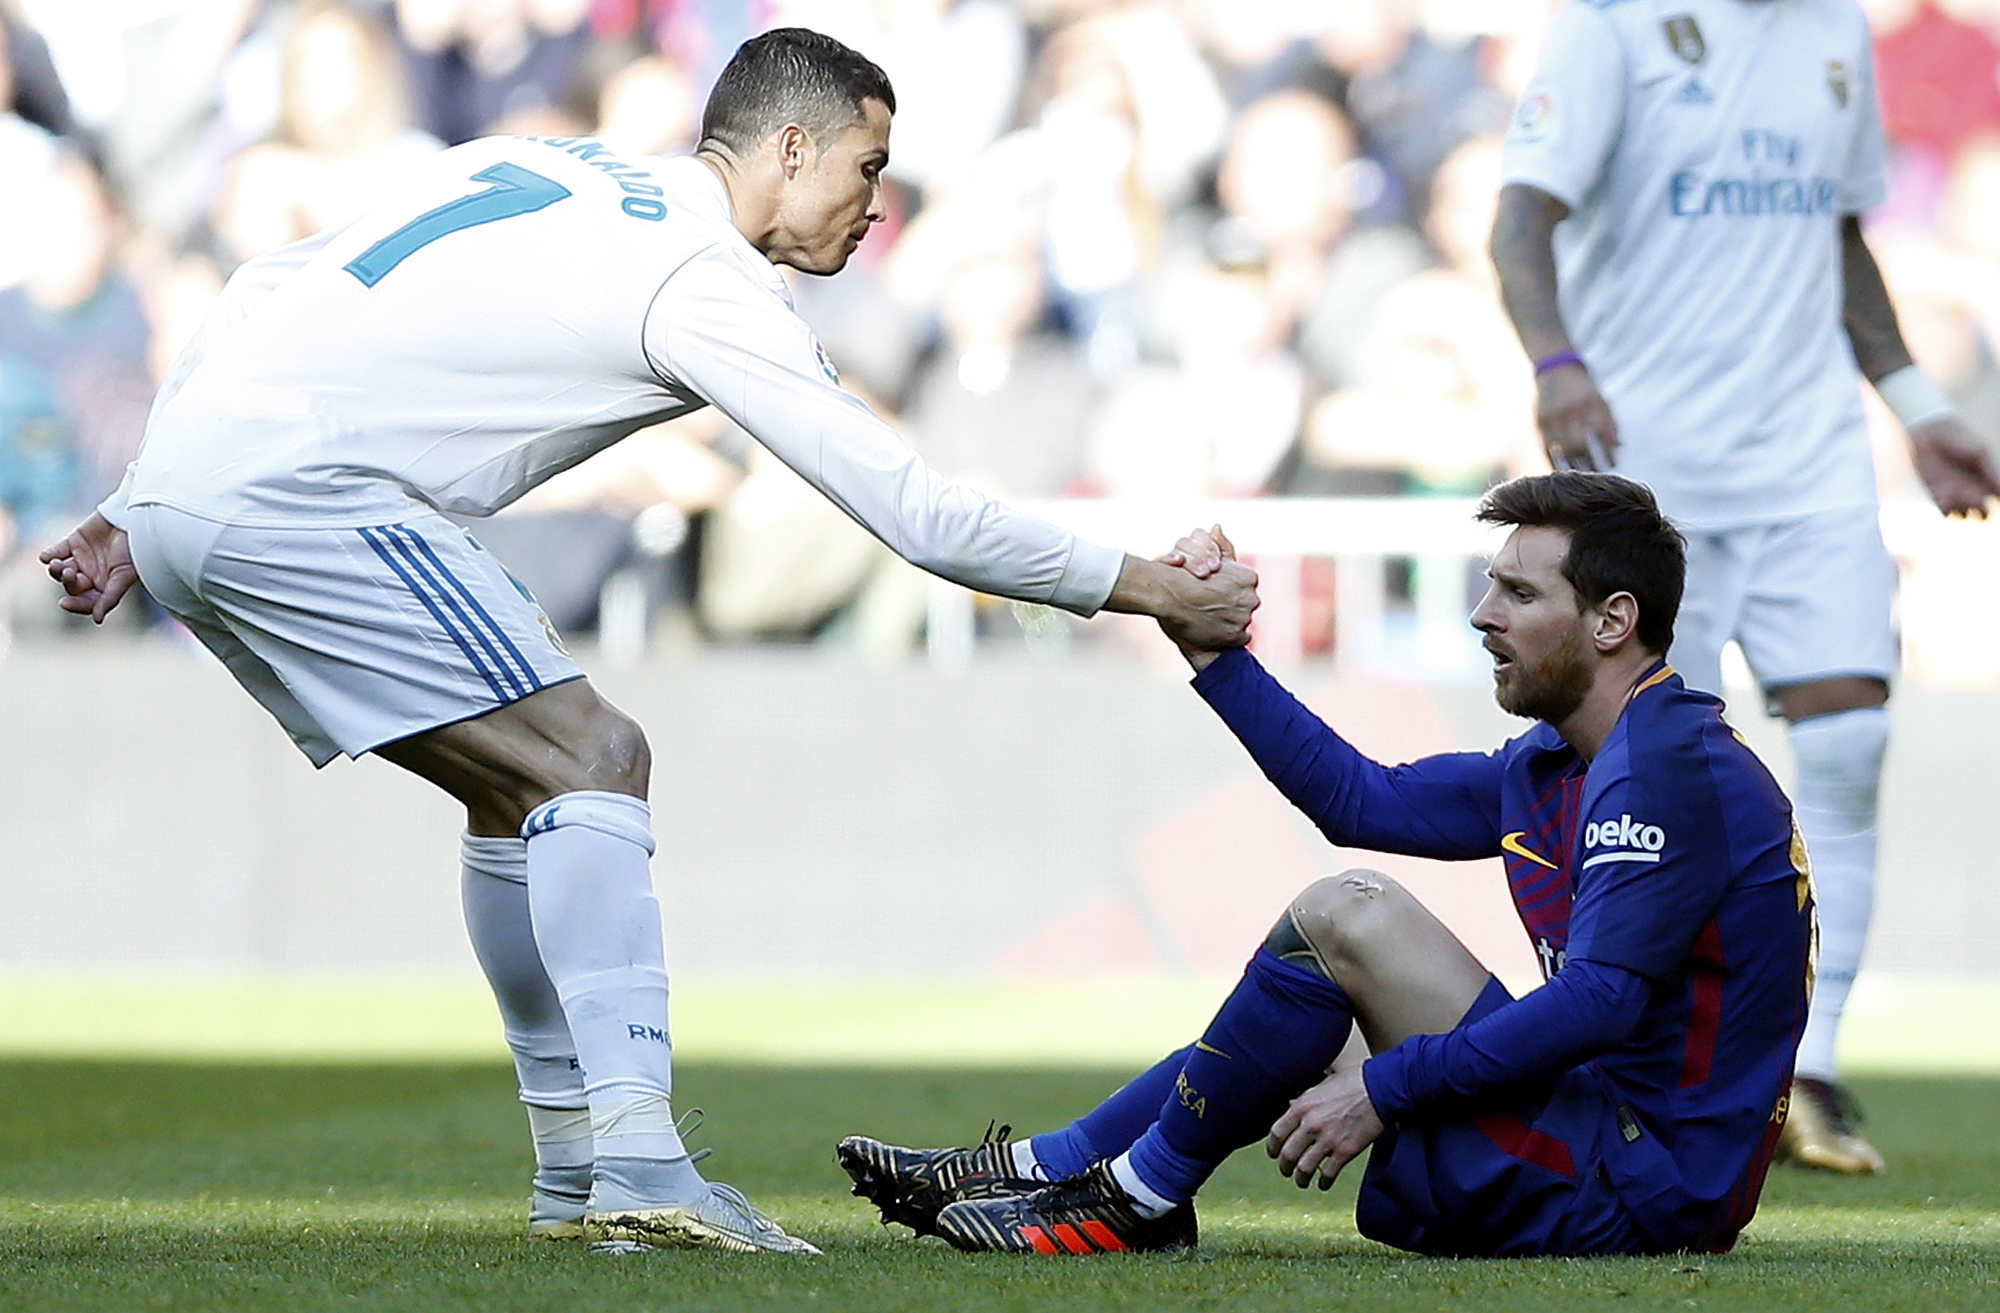 Messi better than Ronaldo - Hazard